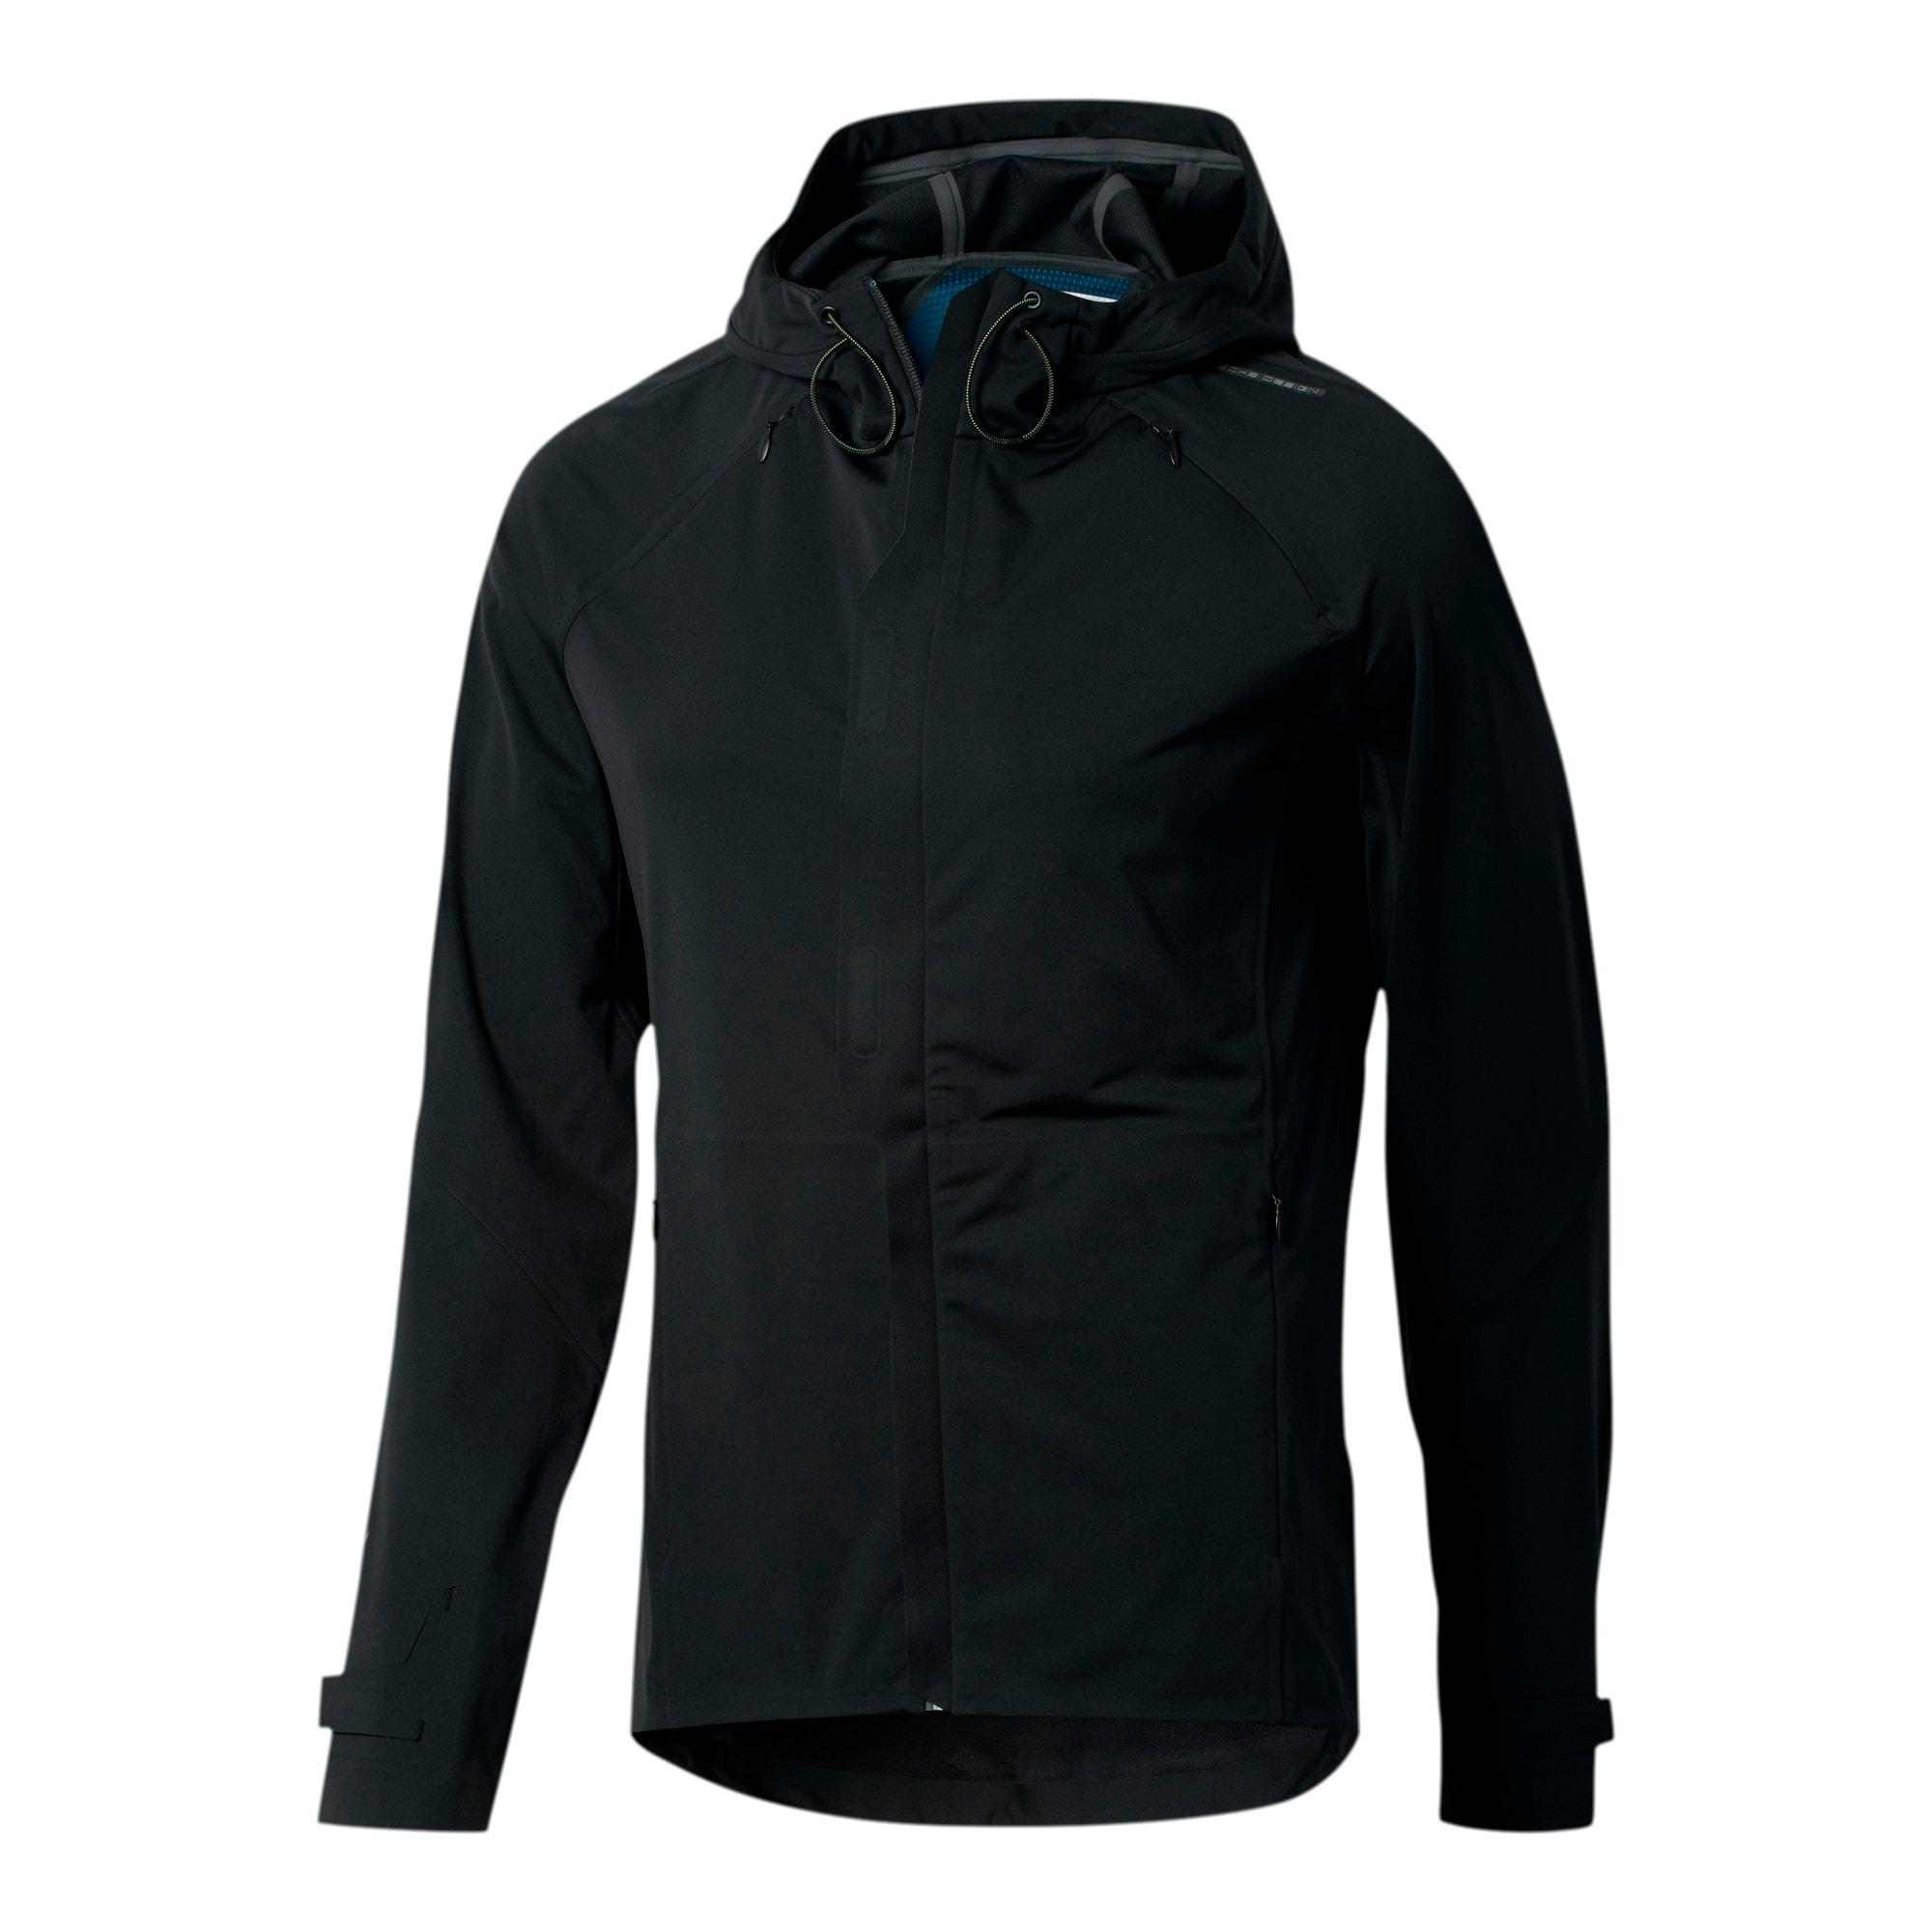 Thumbnail 4 of Porsche Design Active All Day Men's Jacket, Jet Black, medium